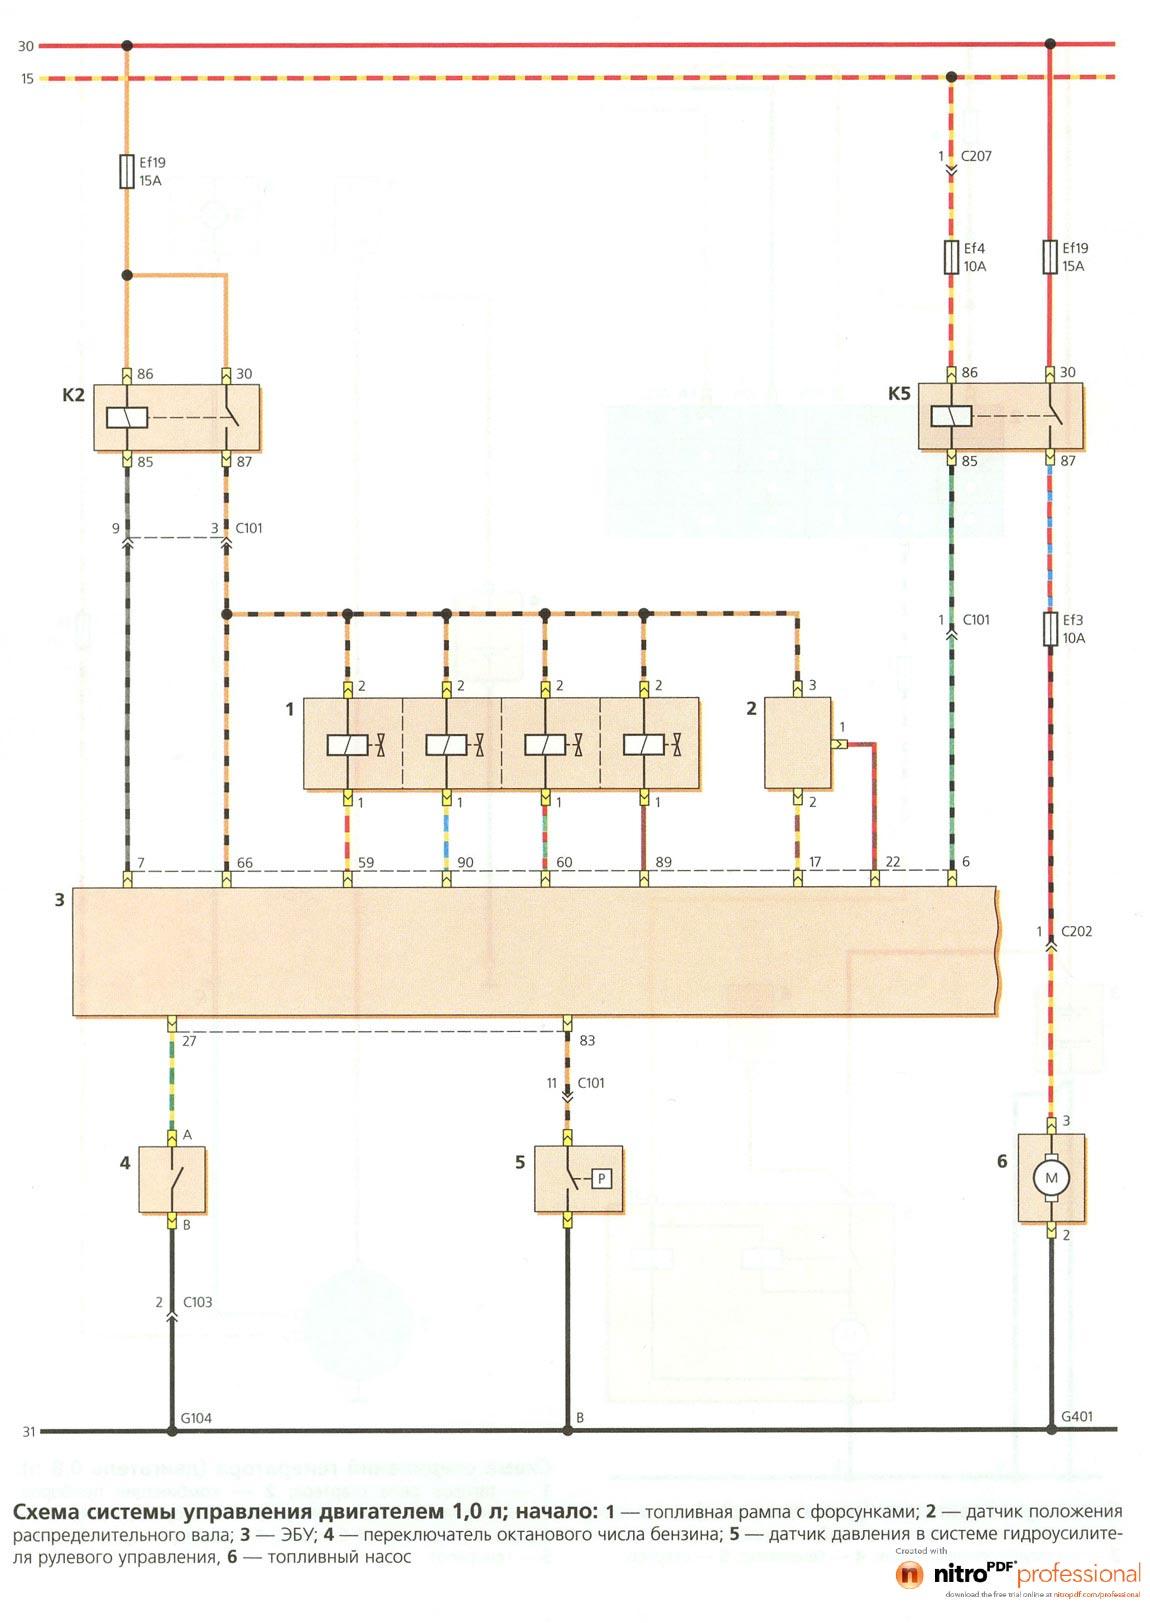 Daewoo tacuma схема электрооборудования